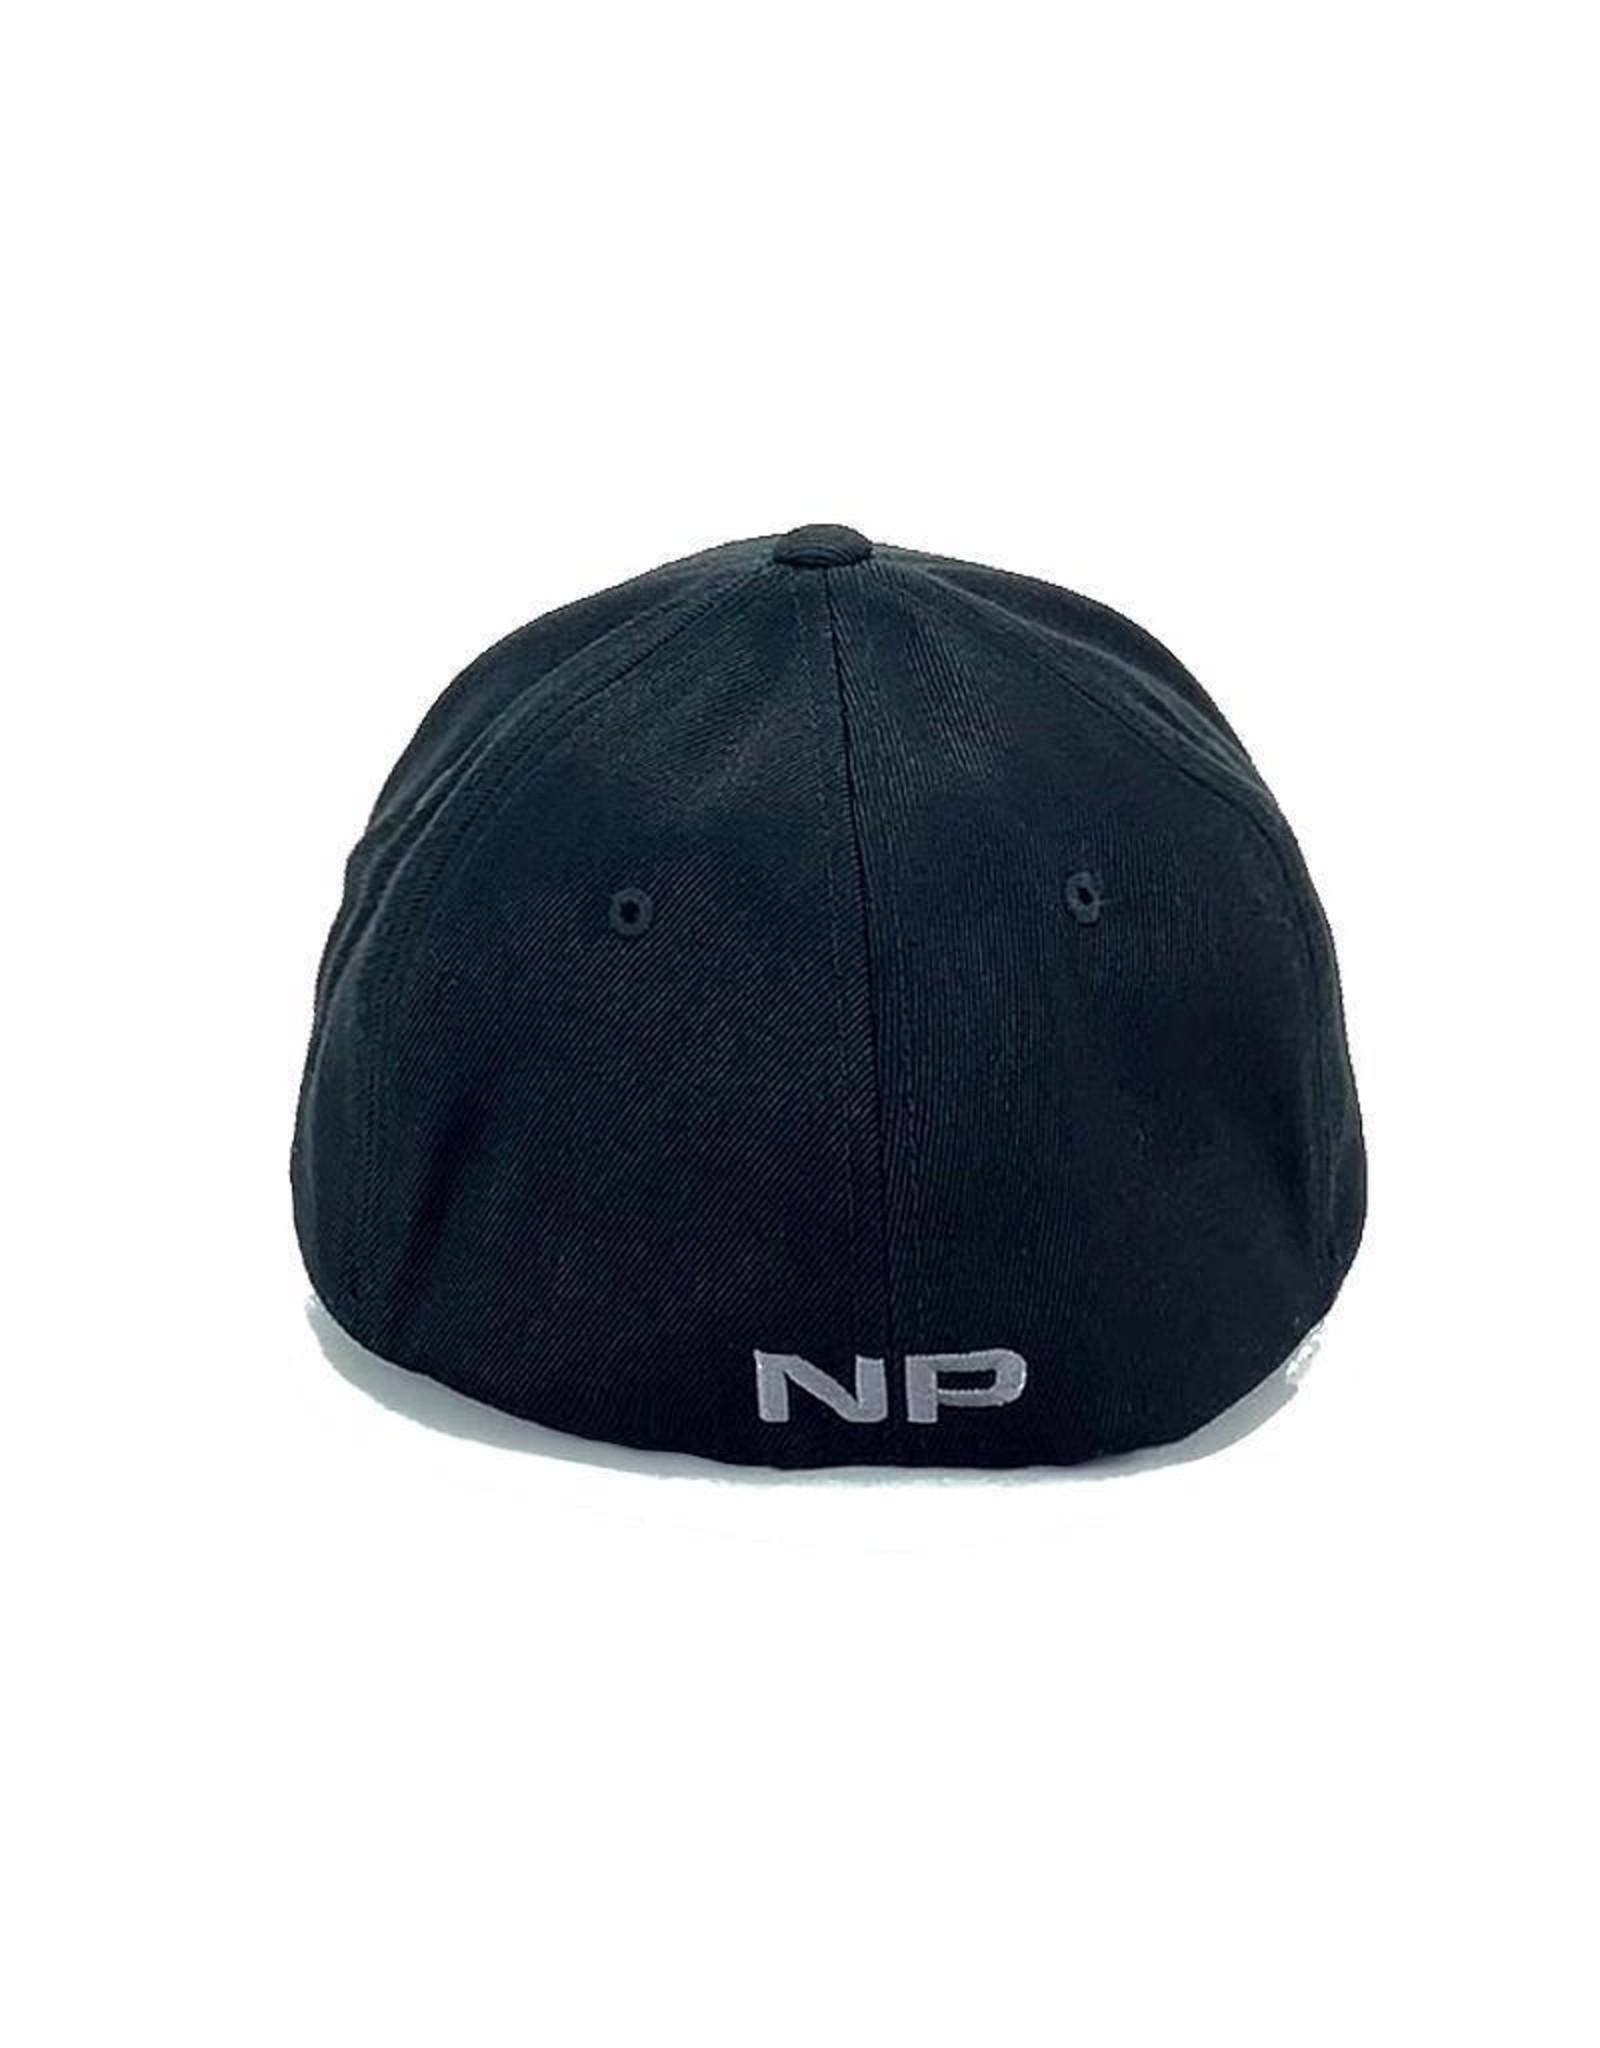 Nasty Pig Nasty Pig Snout Cap 2.0 FW19